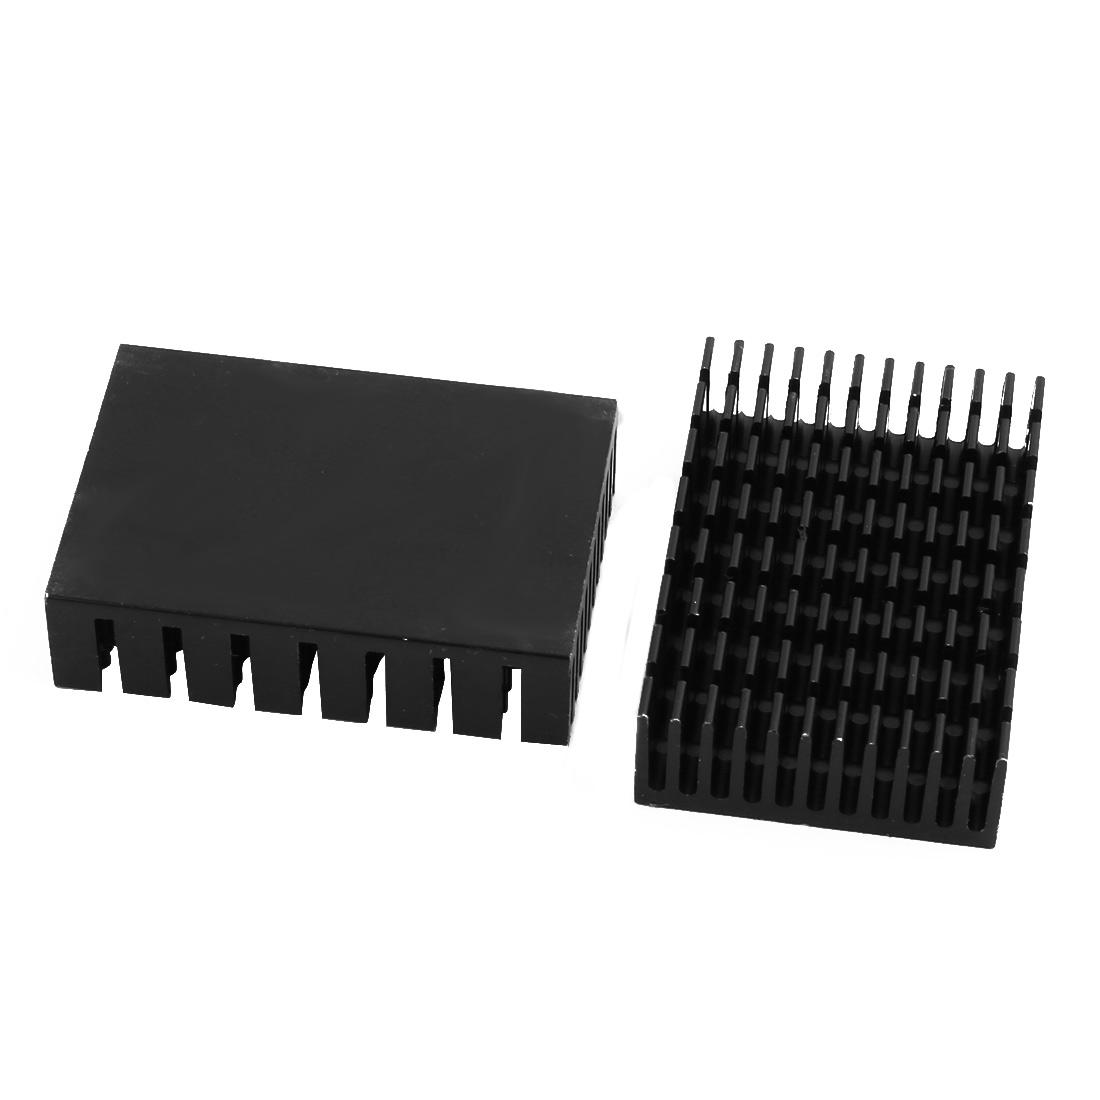 2Pcs 45mm x 31mm x 12mm Aluminum Heatsink Heat Diffuse Cooling Fin Black